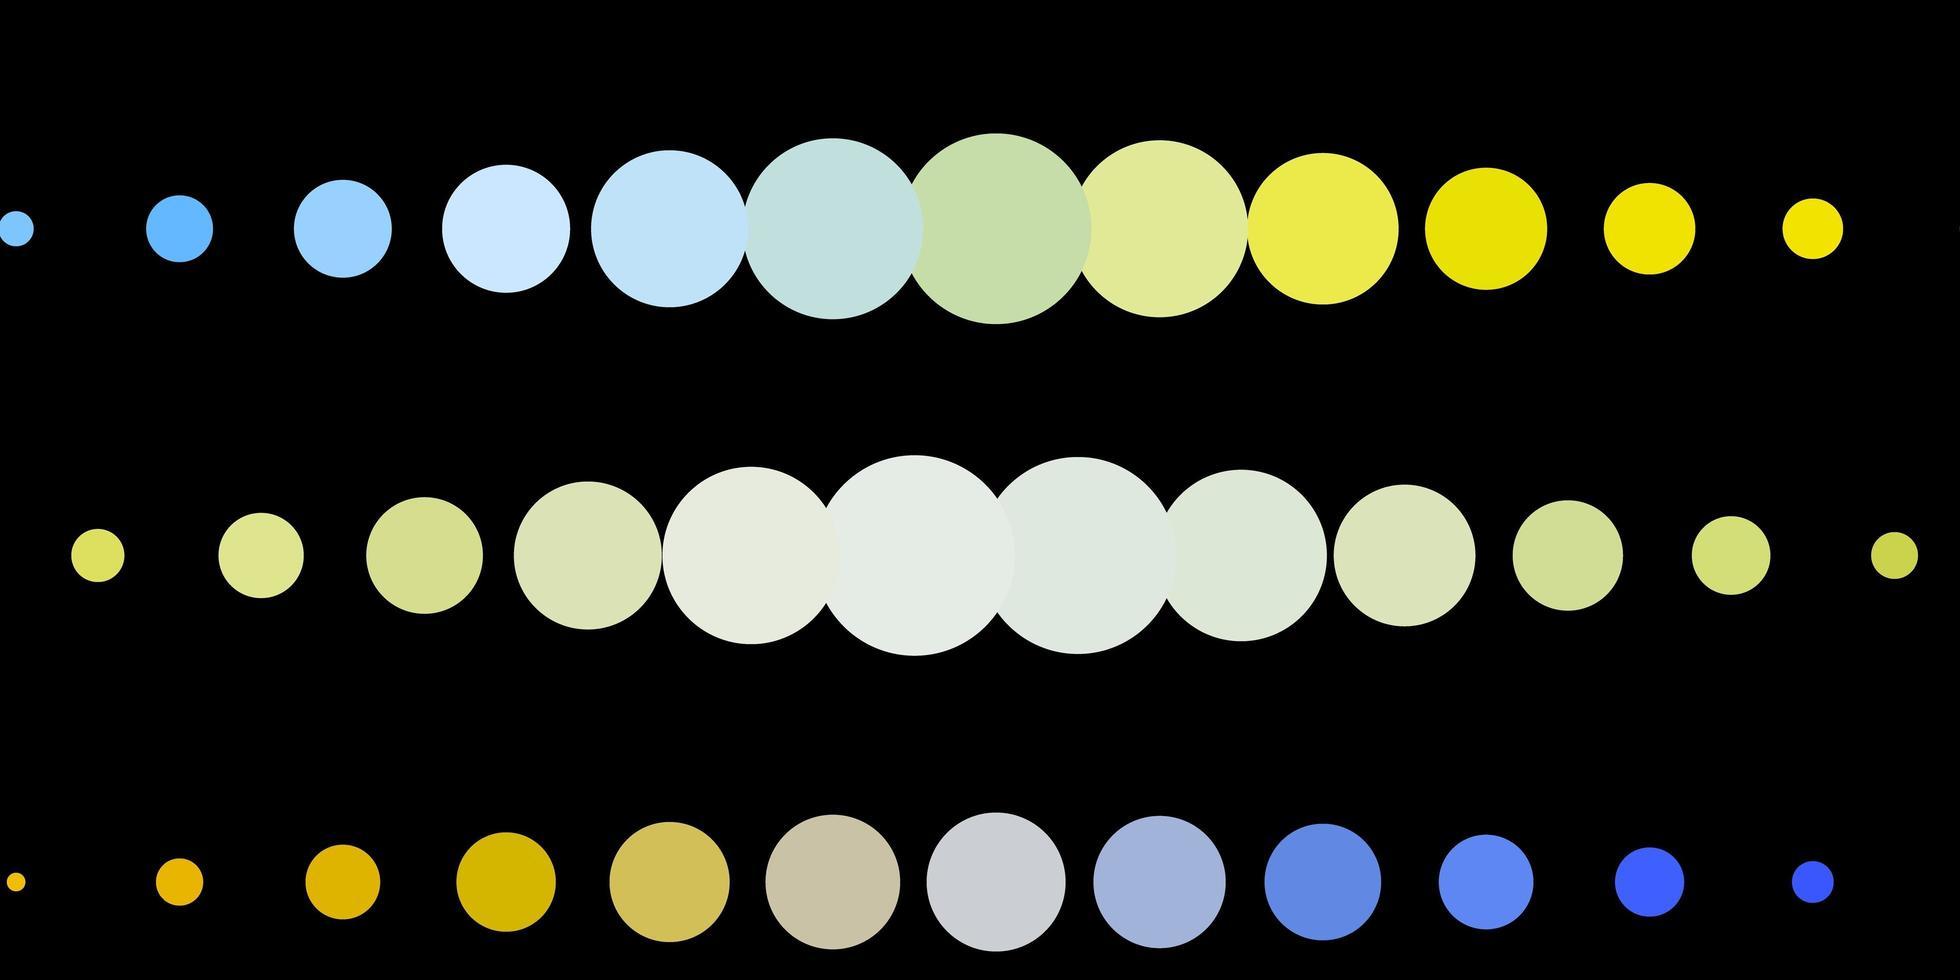 fundo vector azul escuro e amarelo com bolhas.